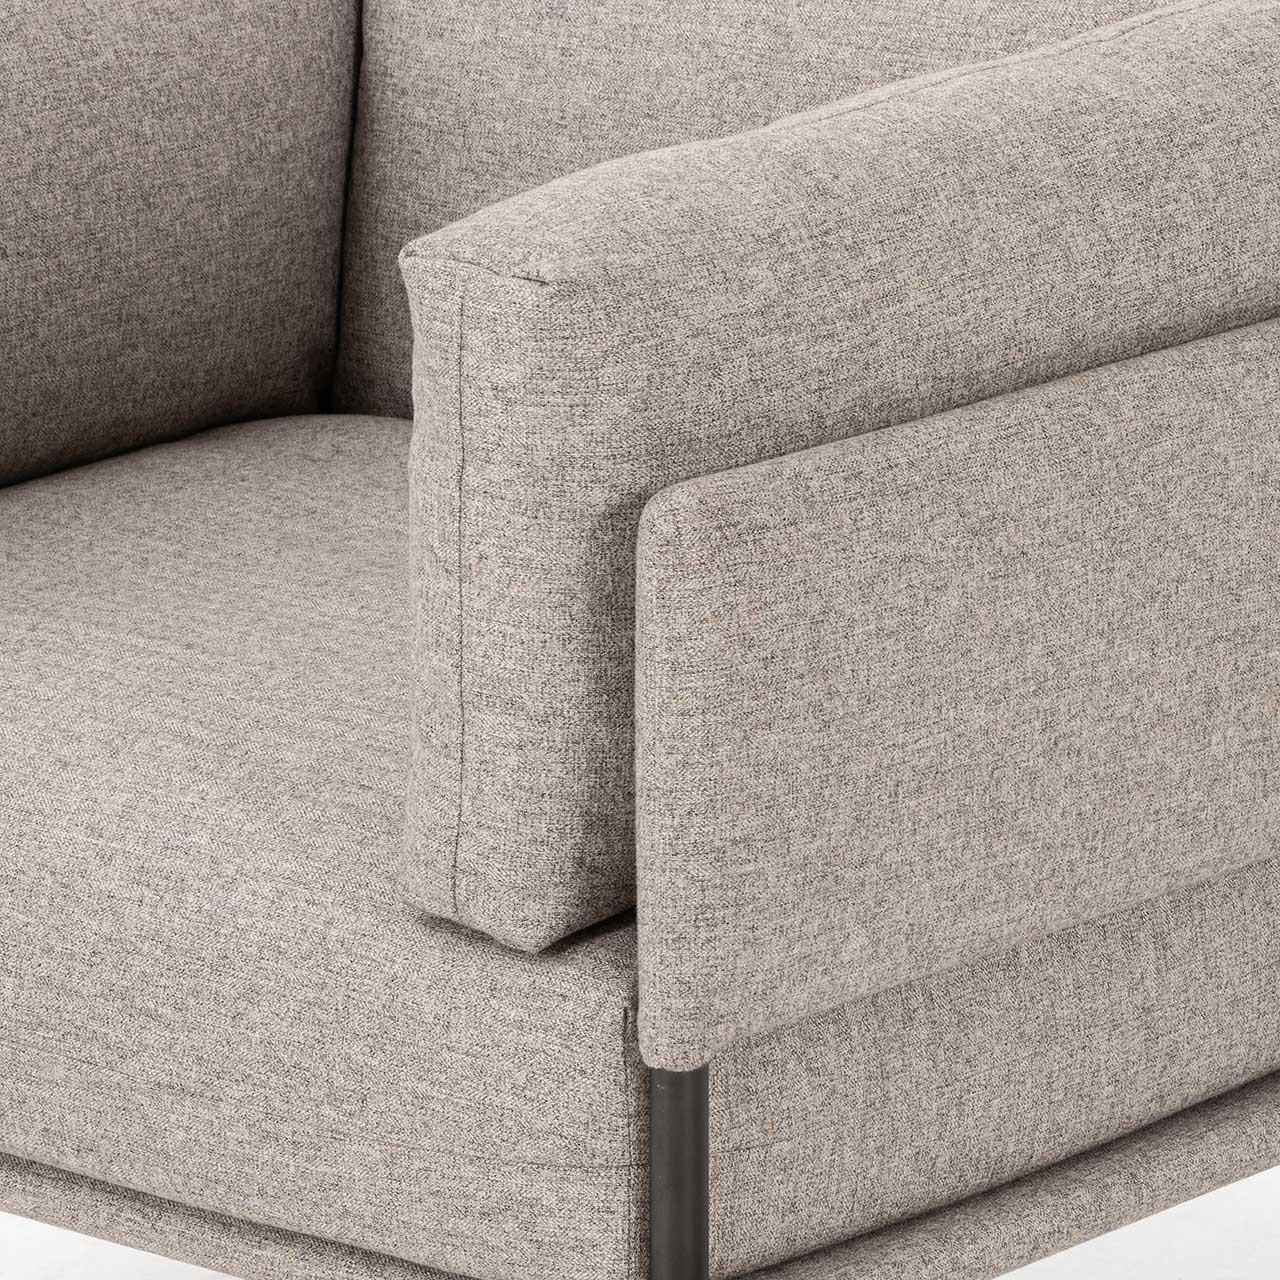 Kora Chair